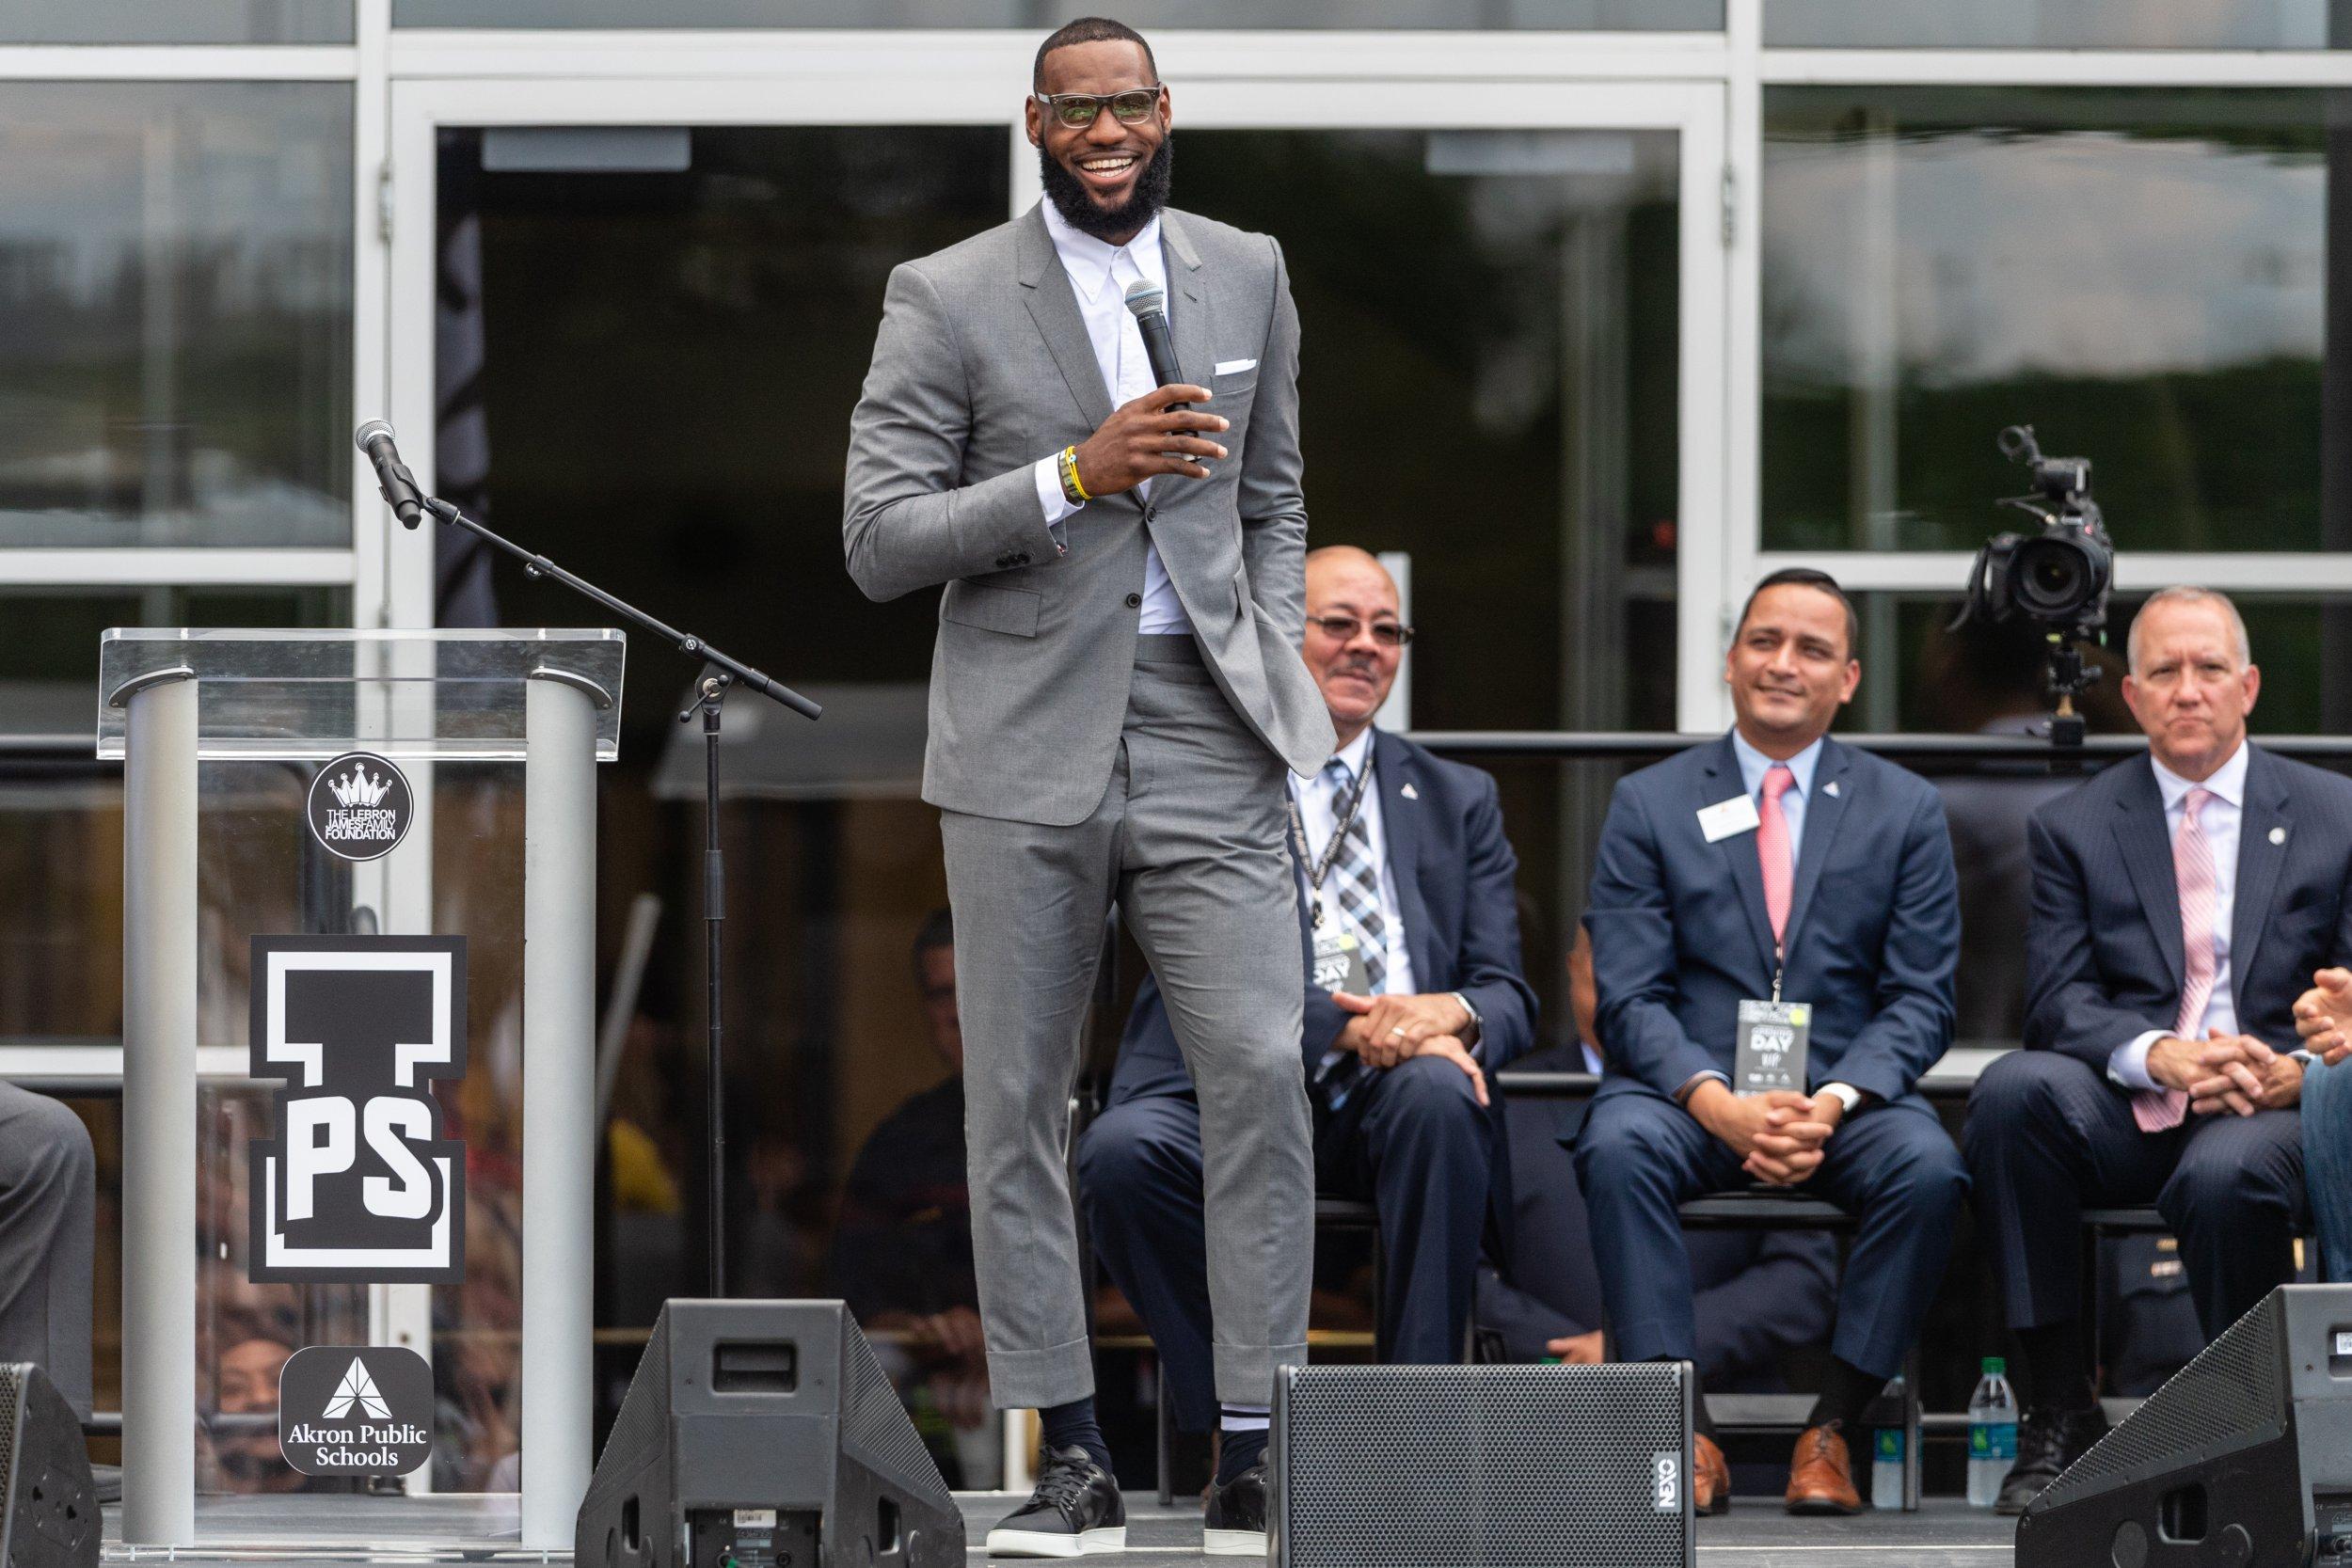 'Joke's on you': LeBron gloats as Nike shares hit all-time high